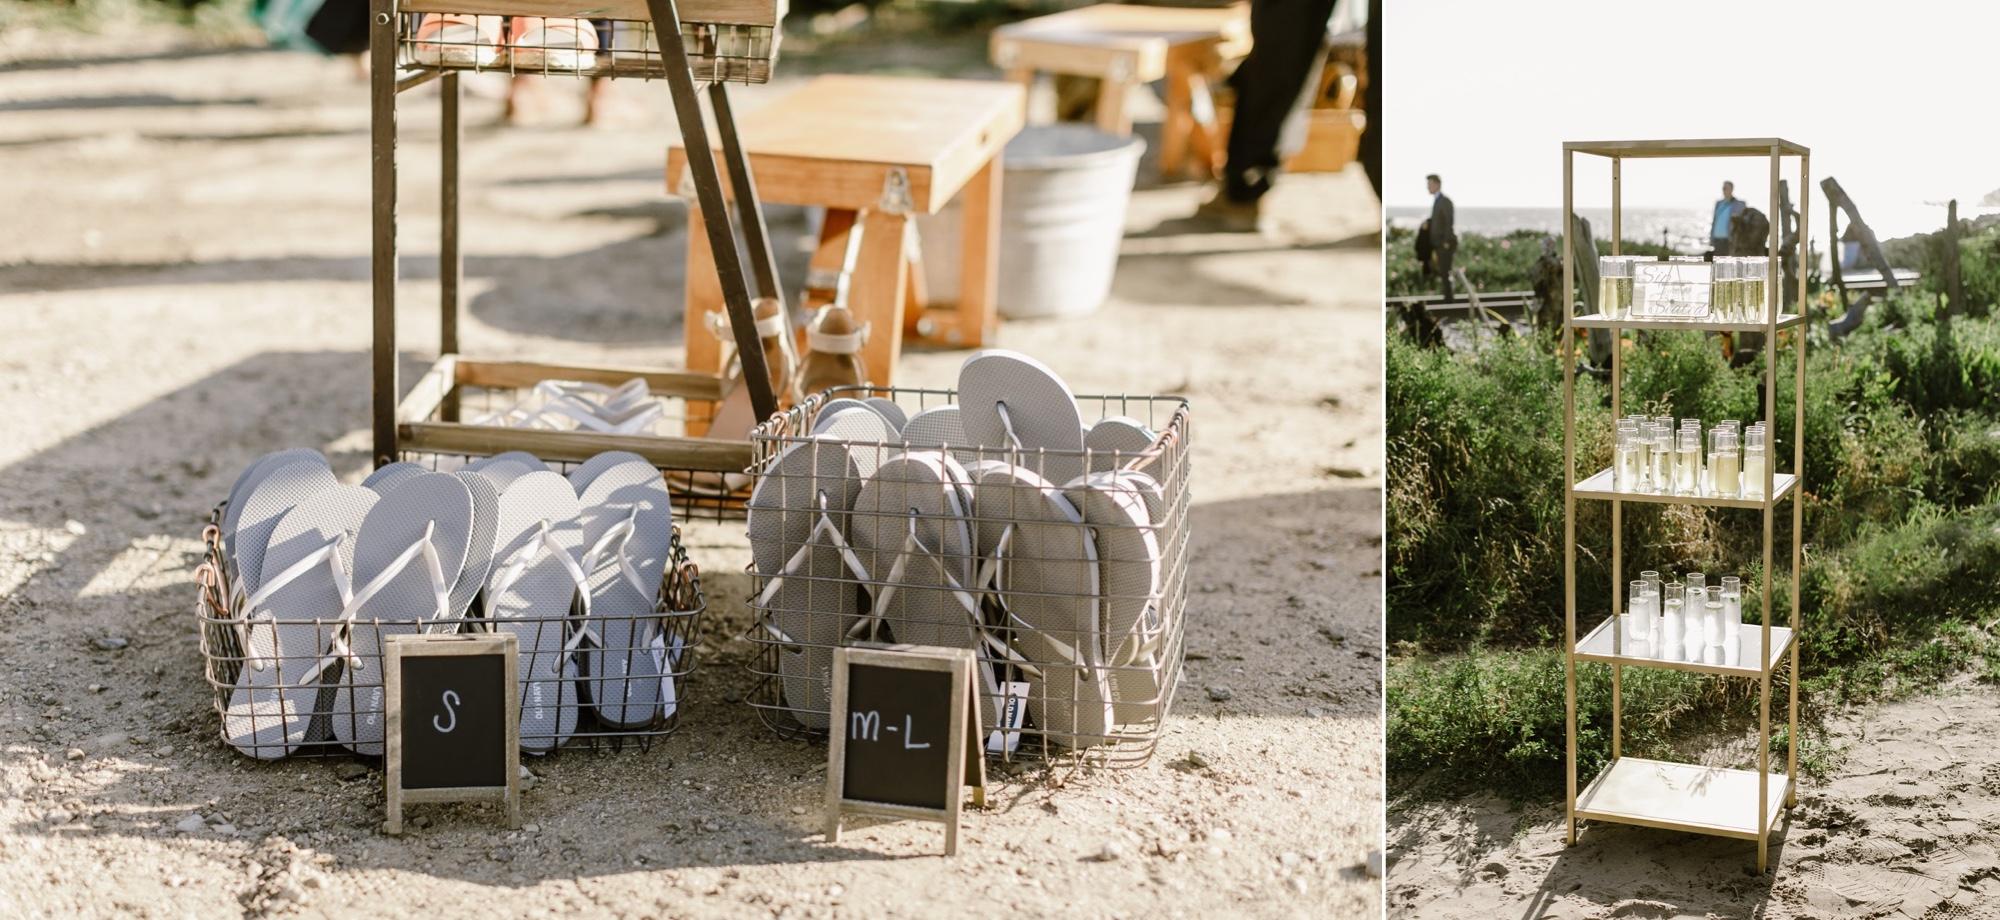 29_Ally and Tommy's Wedding-478_Ally and Tommy's Wedding-102_beach_sandals_wedding_ceremony_for.jpg